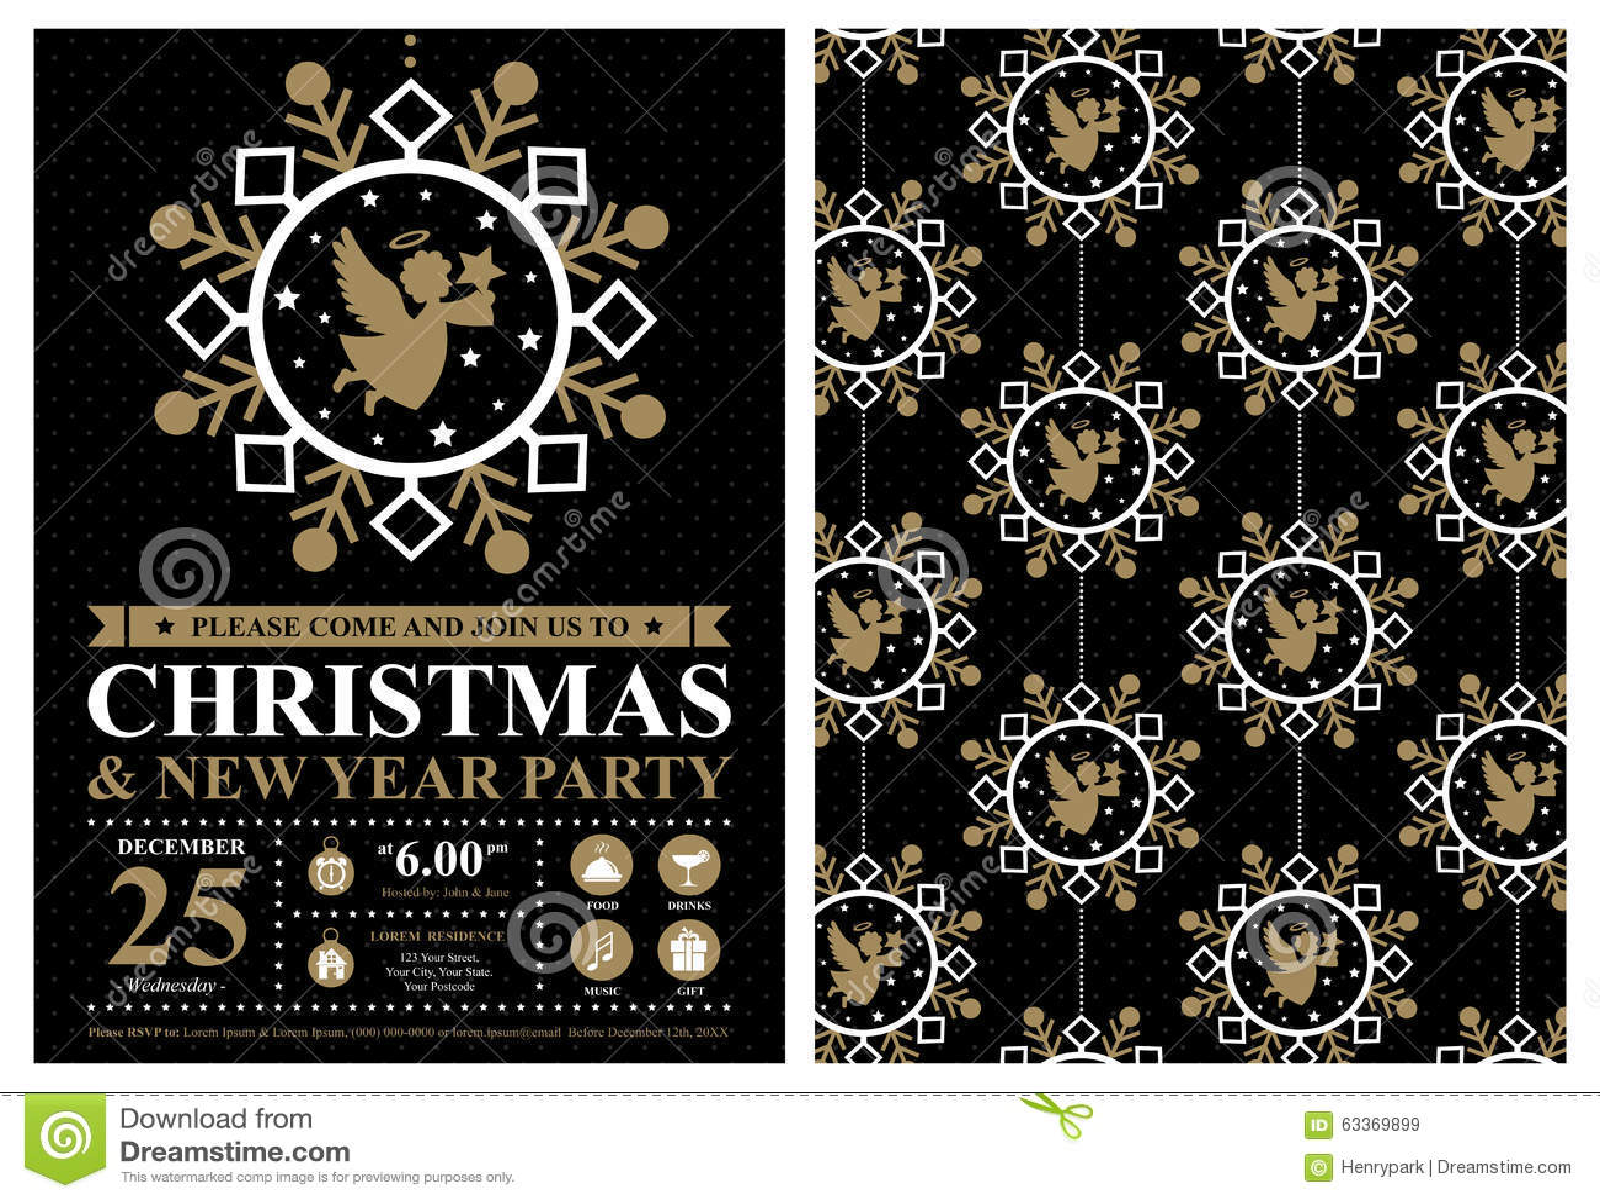 Christmas Invitation Card Stock Vector Illustration Of